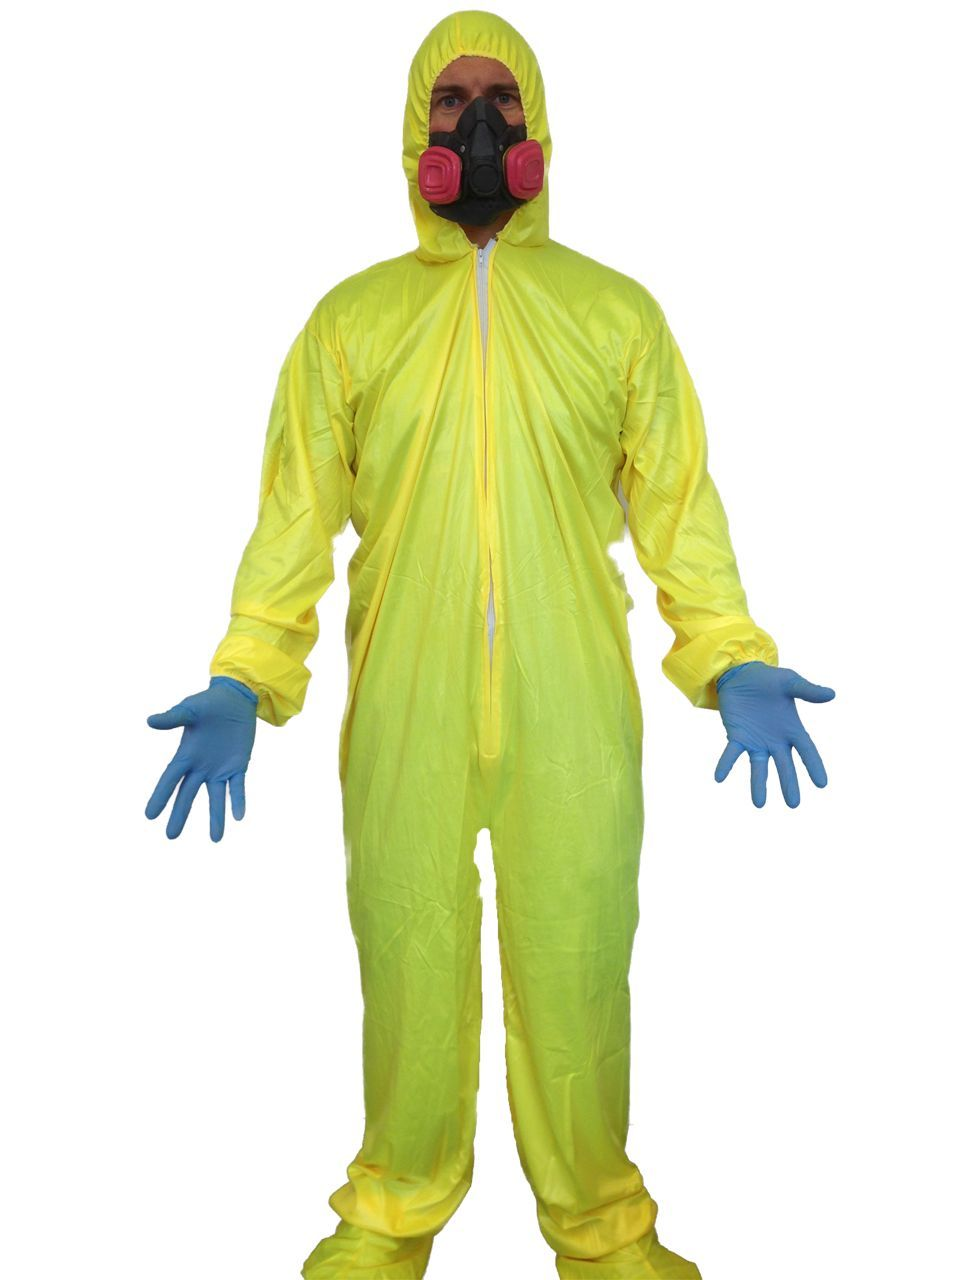 Heisenberg Halloween Costume. The Perfect Breaking Bad Walter ...